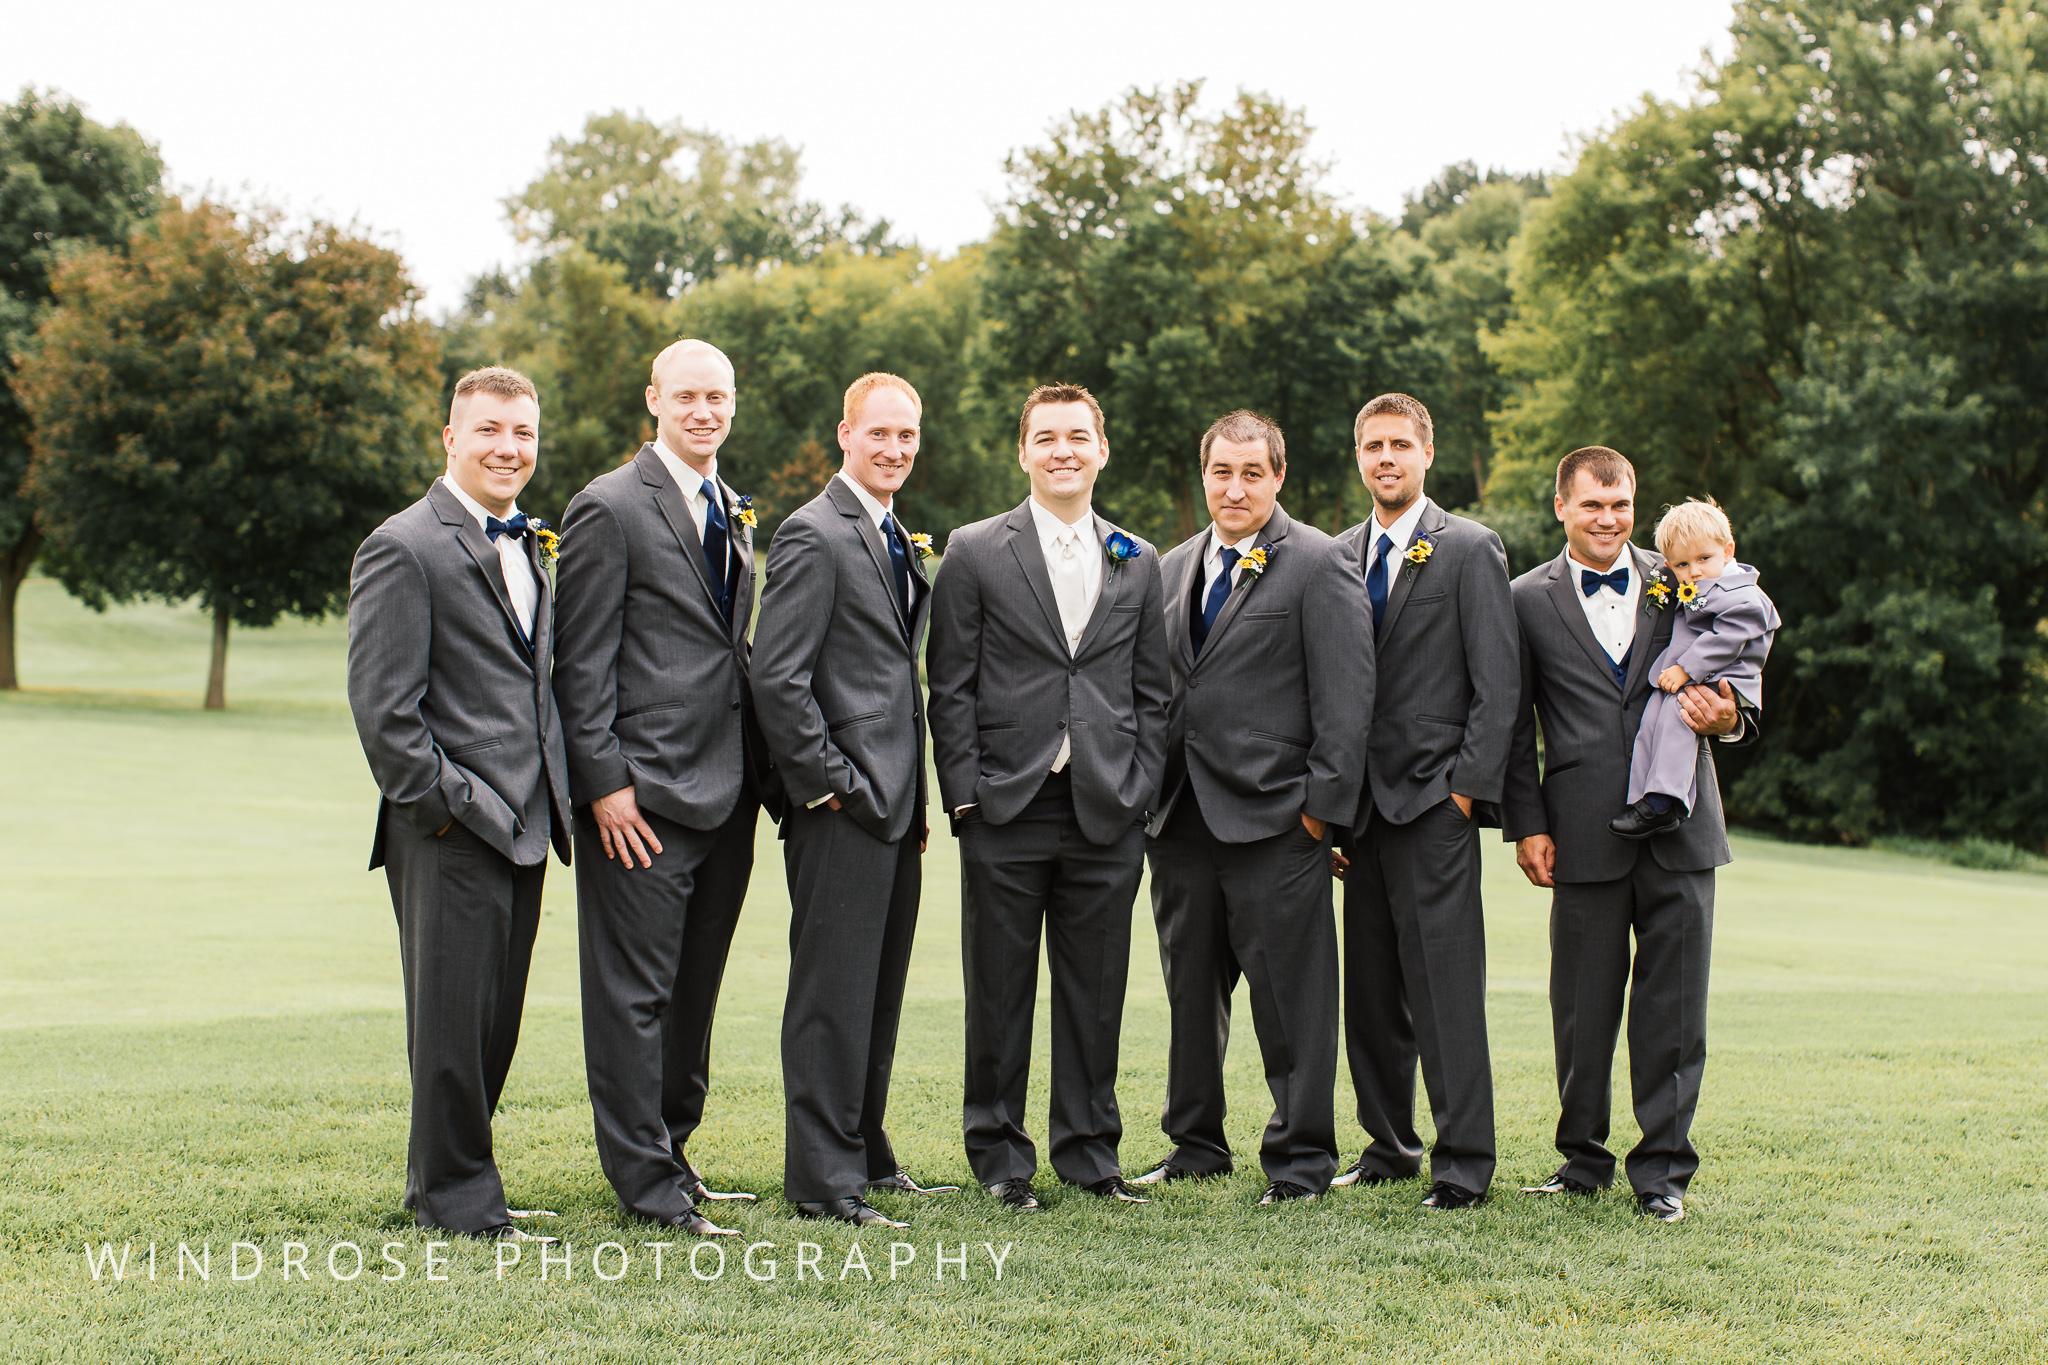 La-Crosse-Country-Club-Wedding-Minnesota-Wedding-Photographer-18.jpg